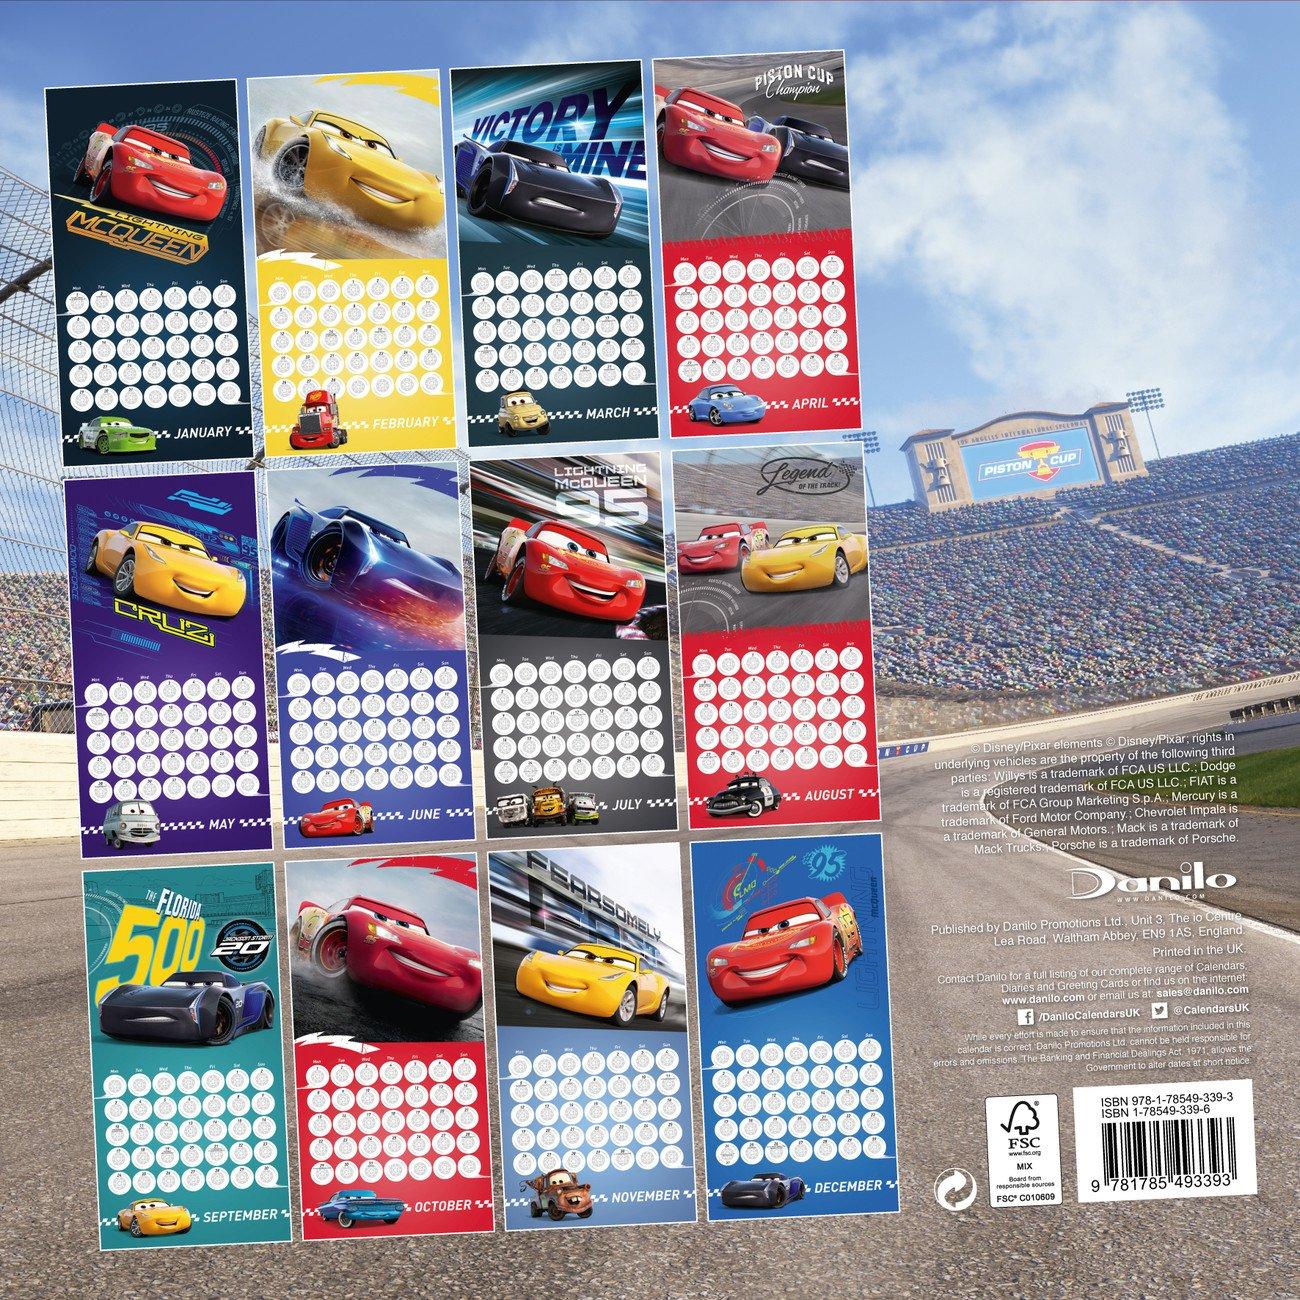 Cars 3 - Calendars 2020 On Ukposters/ukposters Cars 3 Calendar 2019